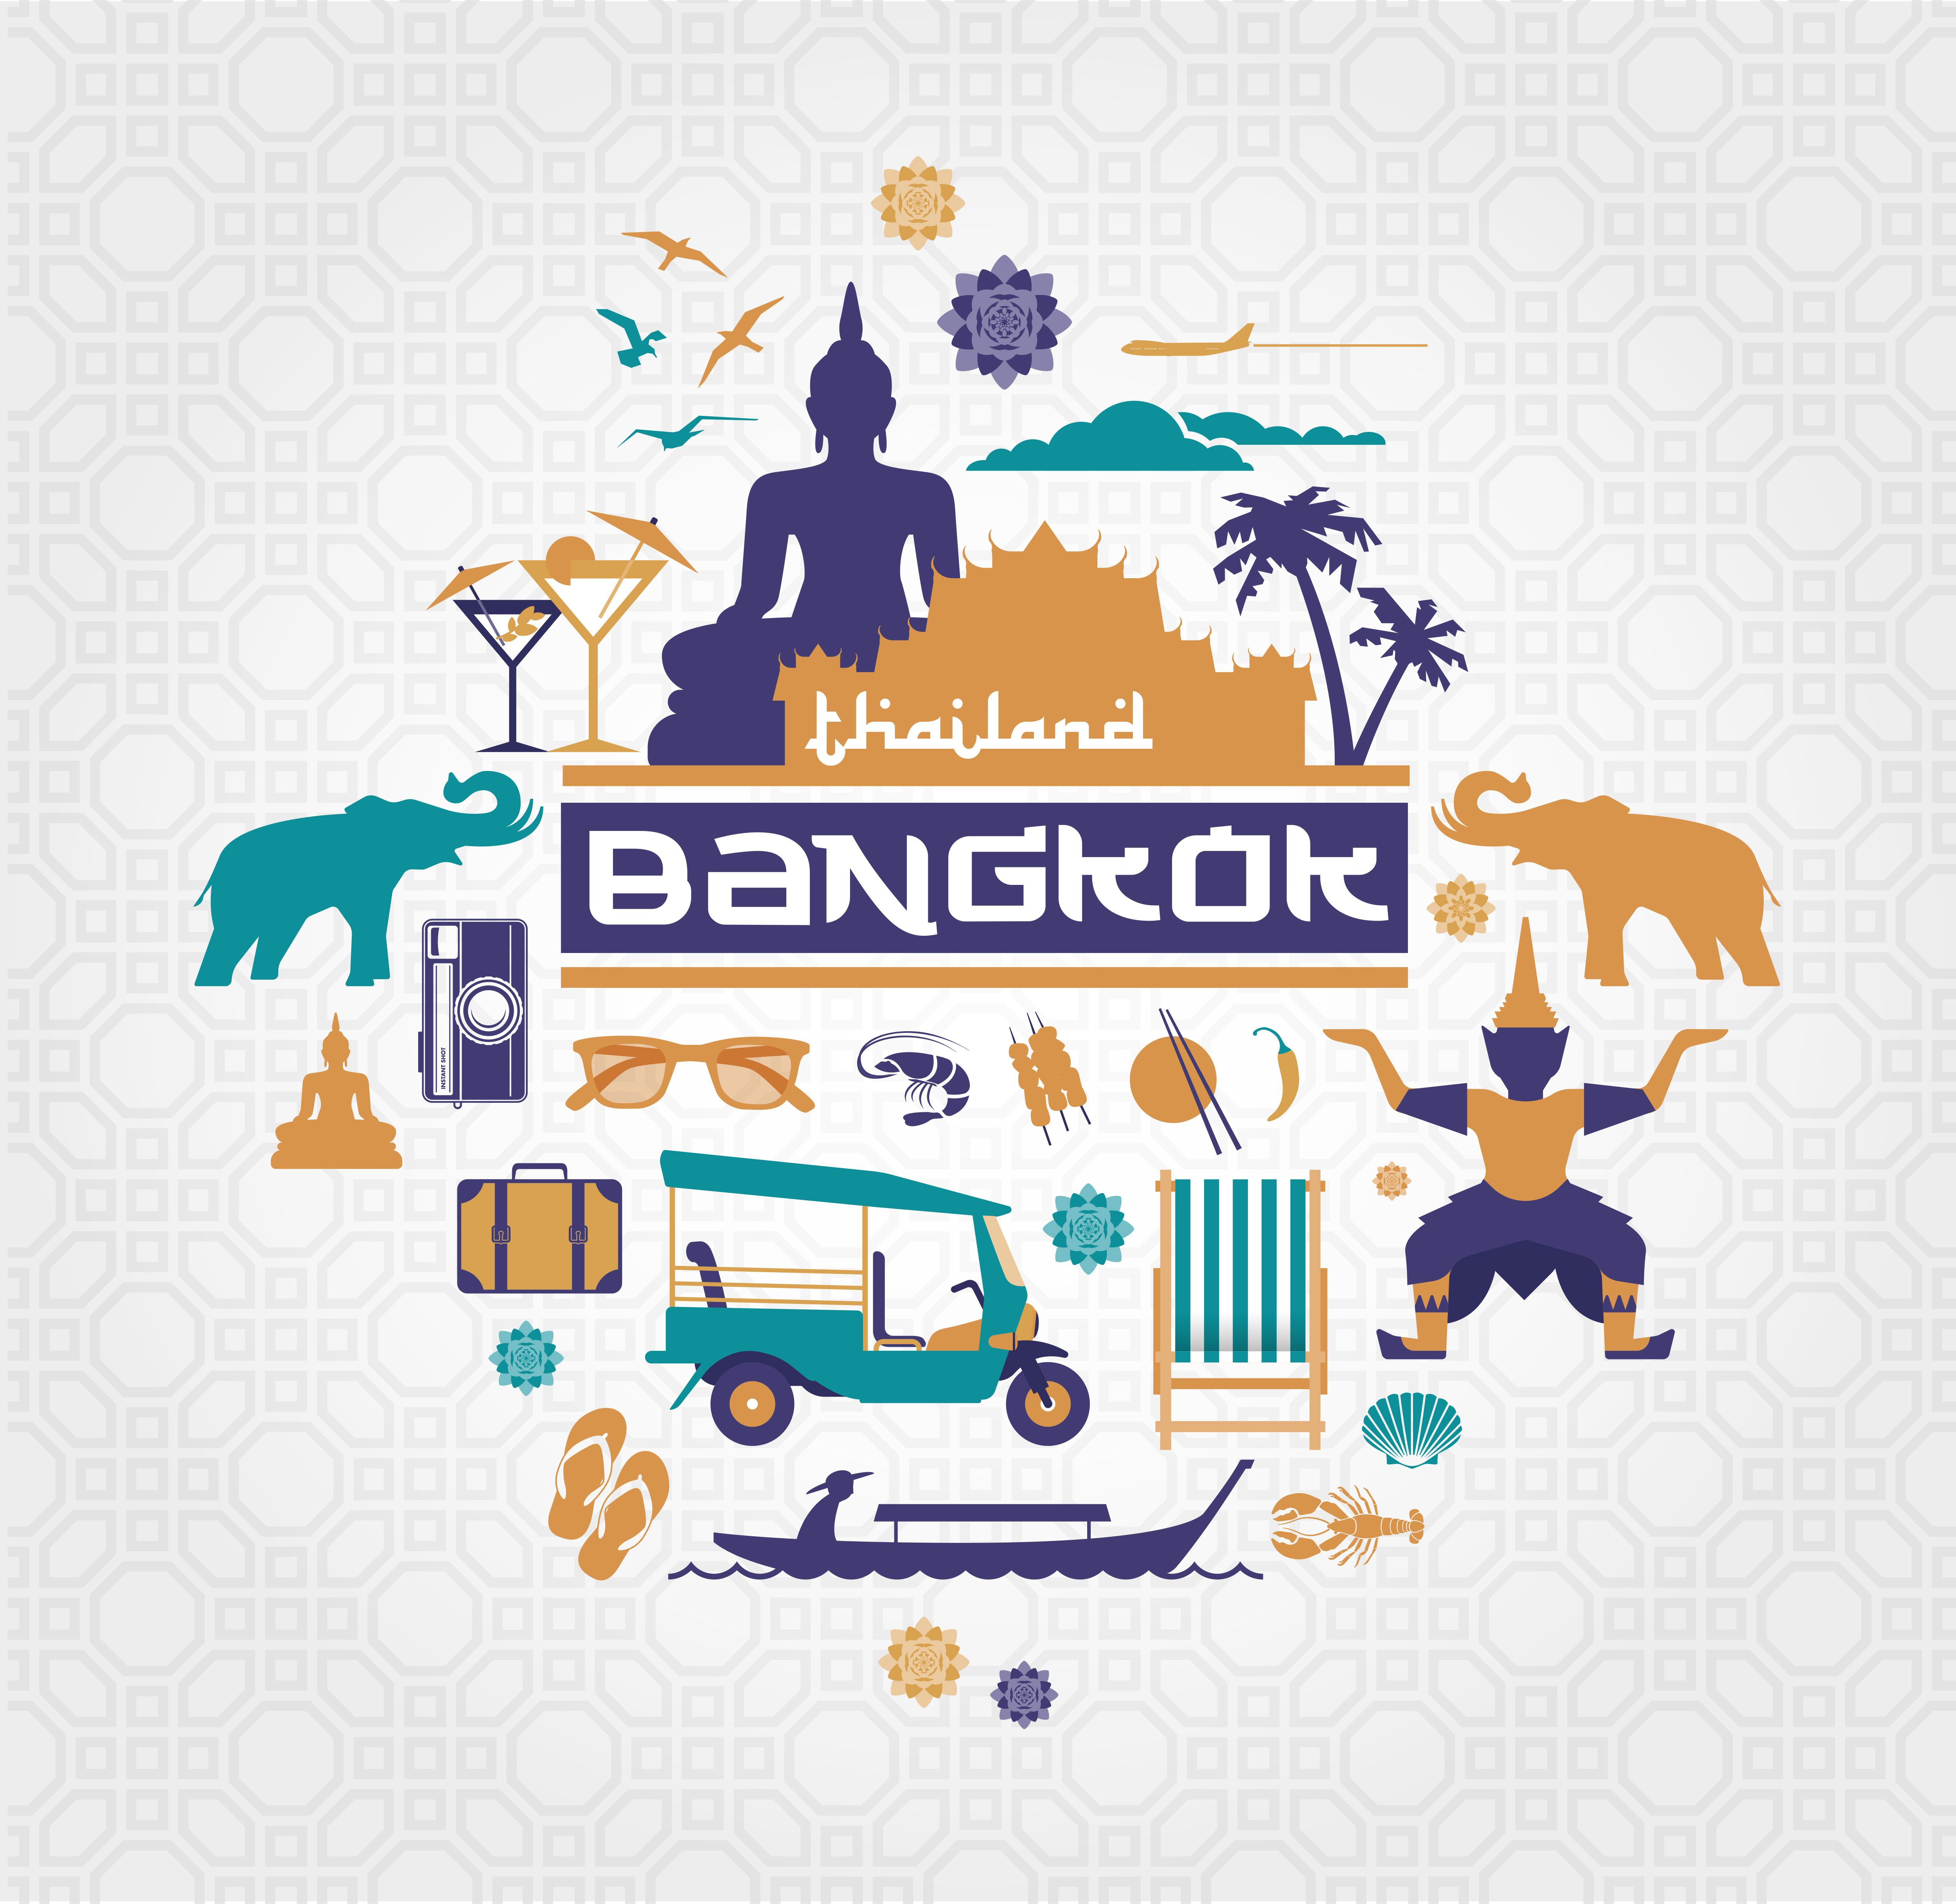 Bangkok Thailand vector set by mactrunk on Creative